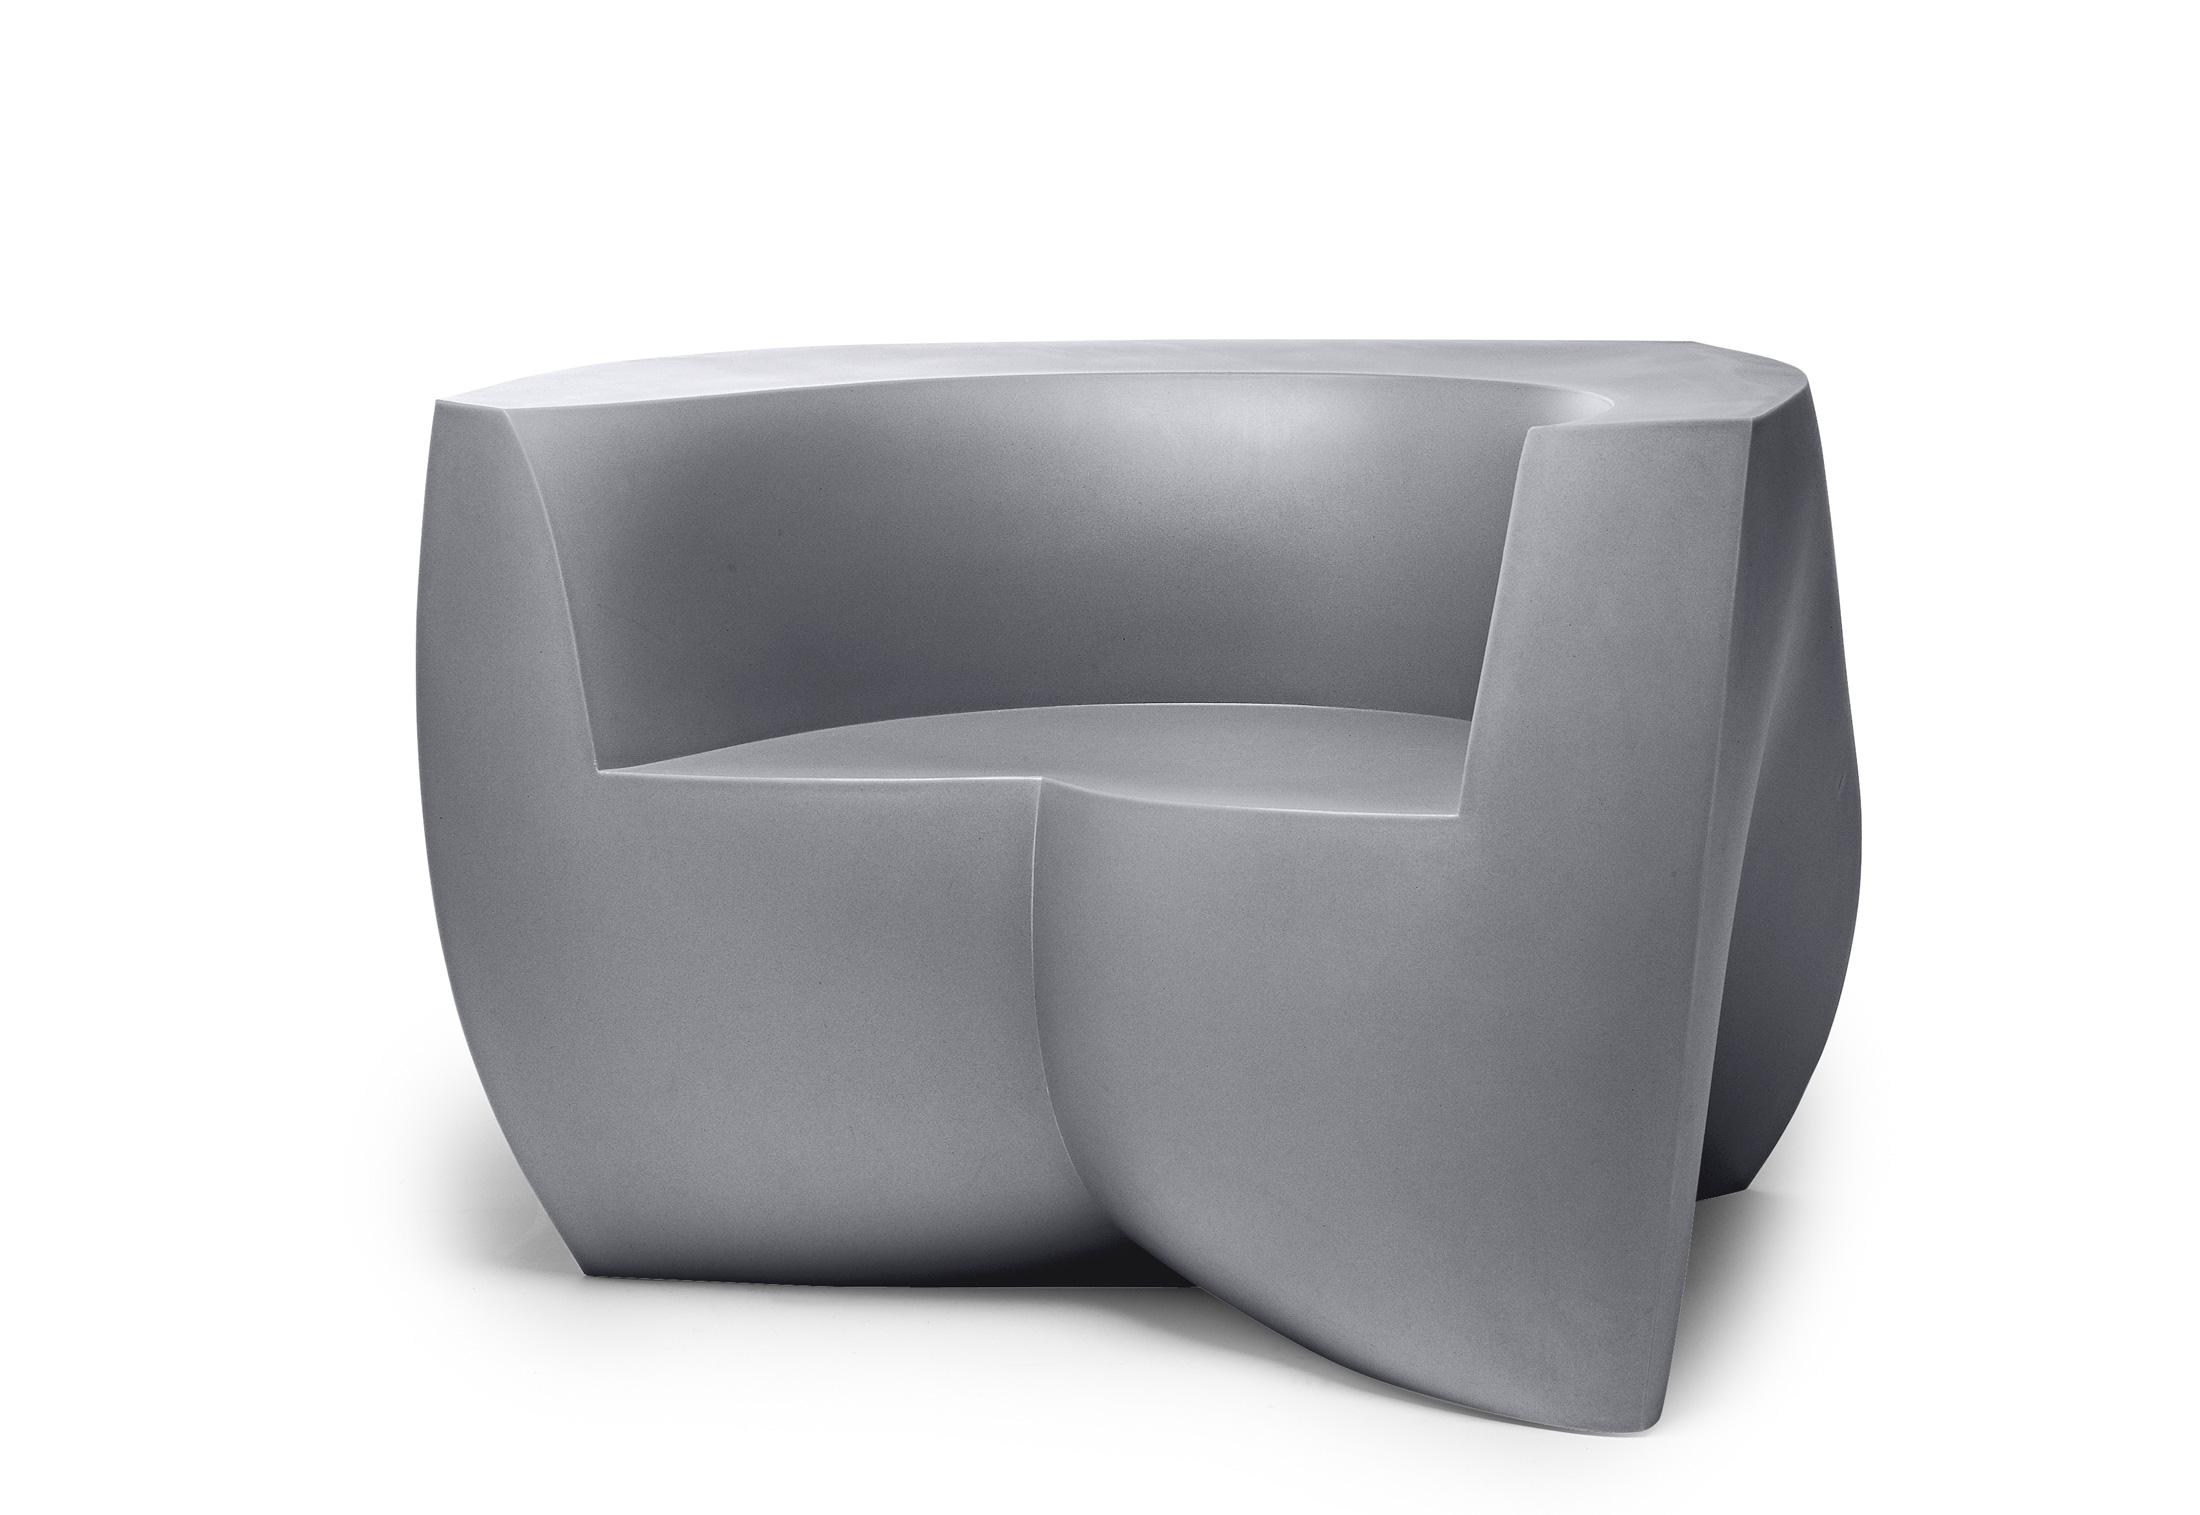 Stupendous Easy Chair By Heller Stylepark Machost Co Dining Chair Design Ideas Machostcouk